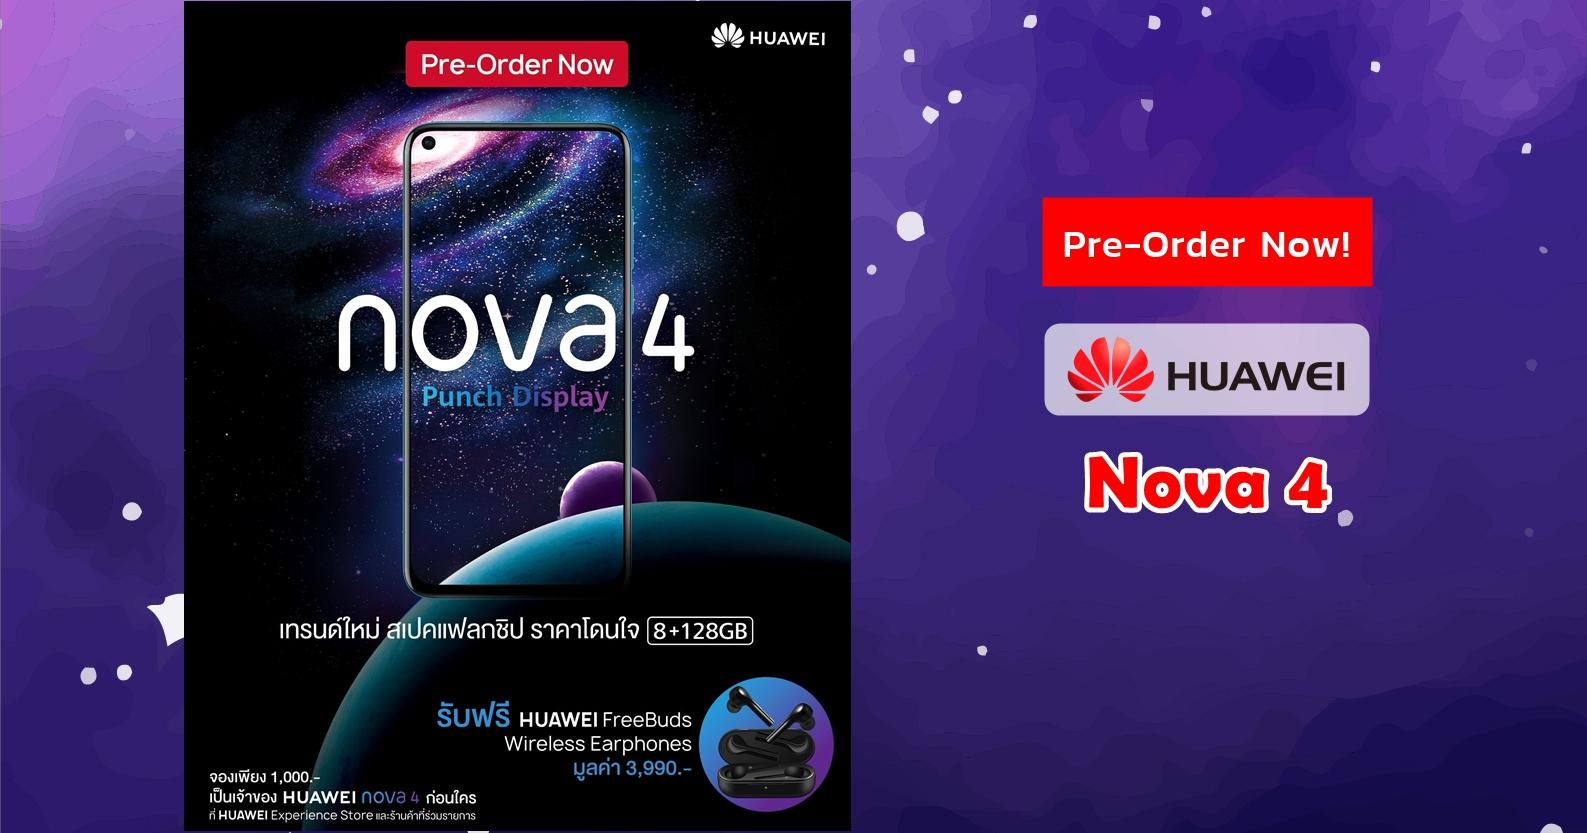 Huawei Nova 4 Pre order